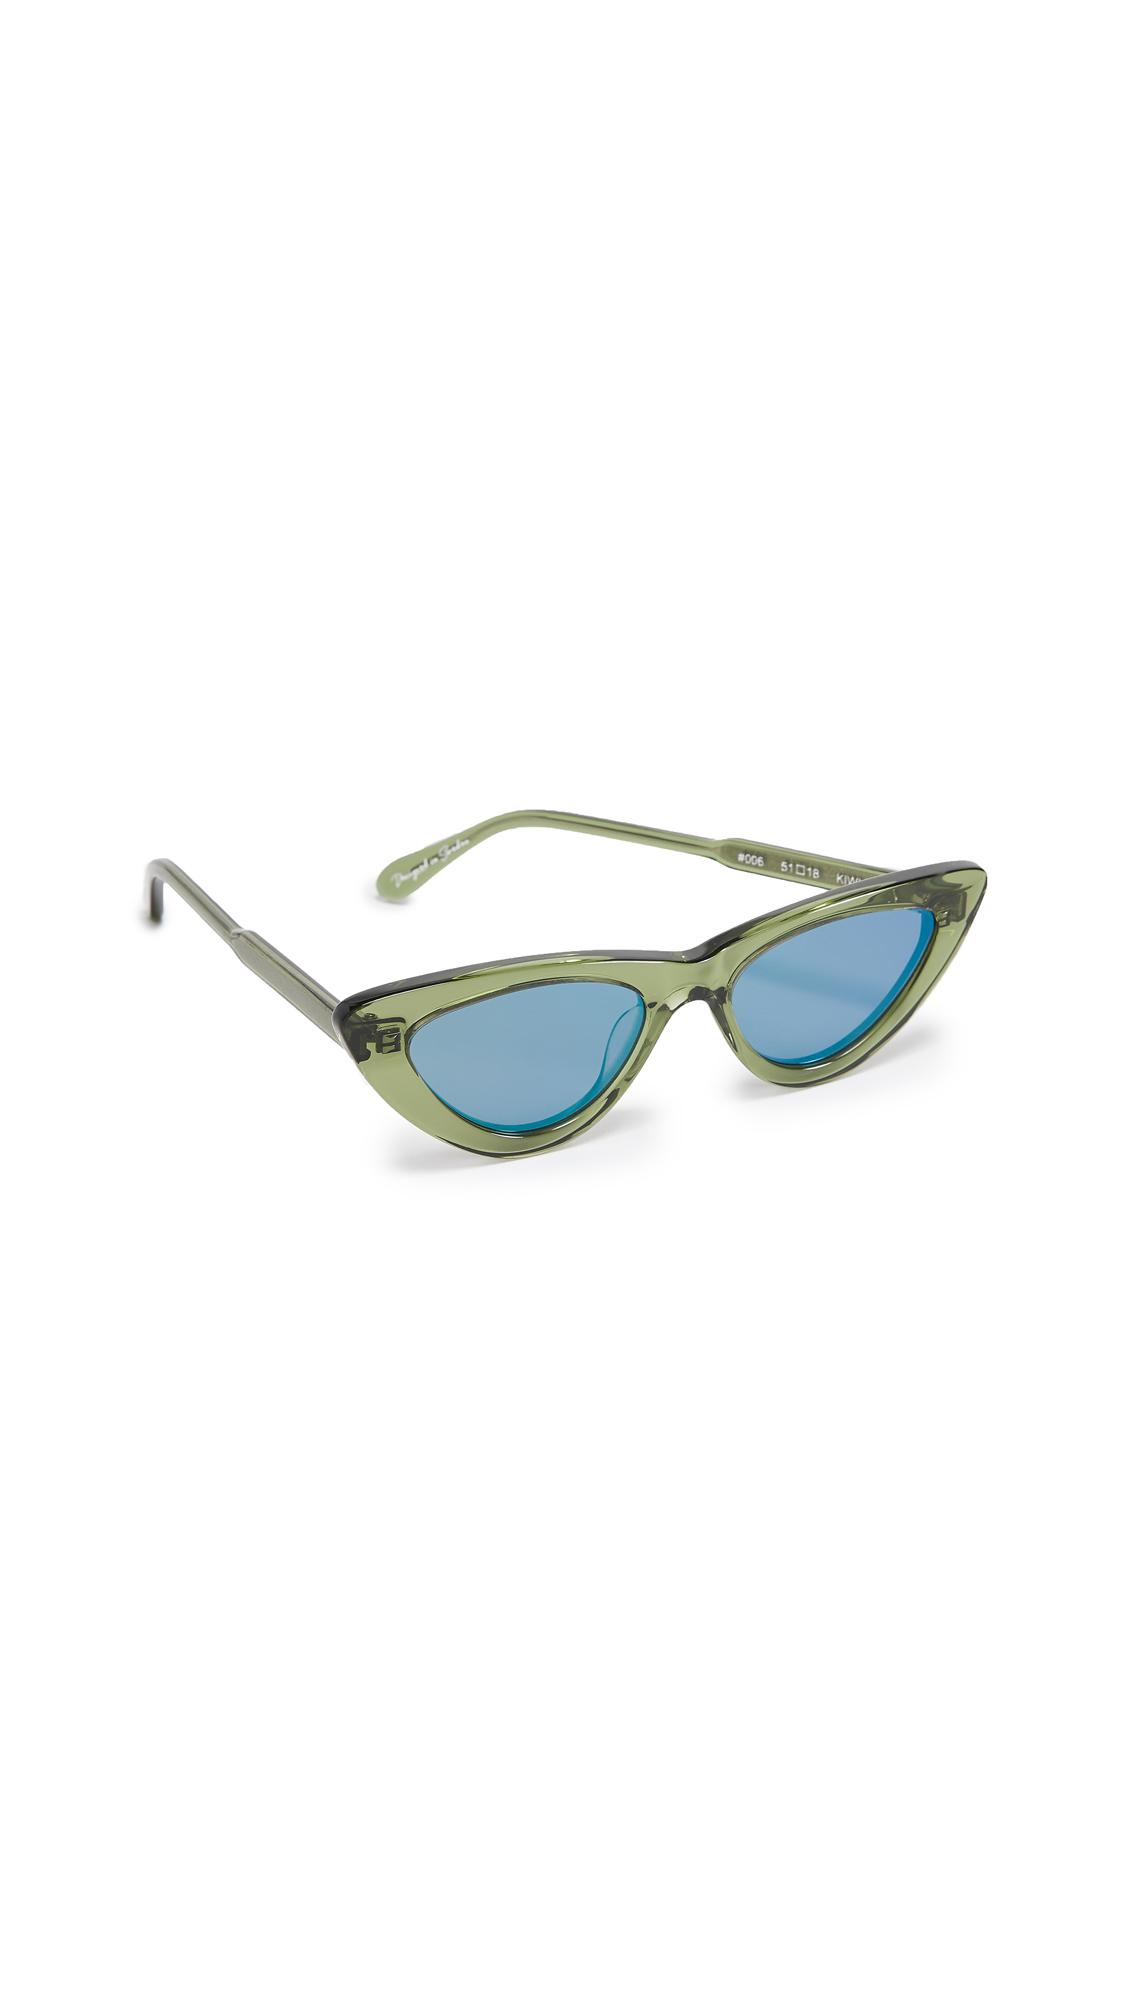 CHIMI 006 Sunglasses in Kiwi